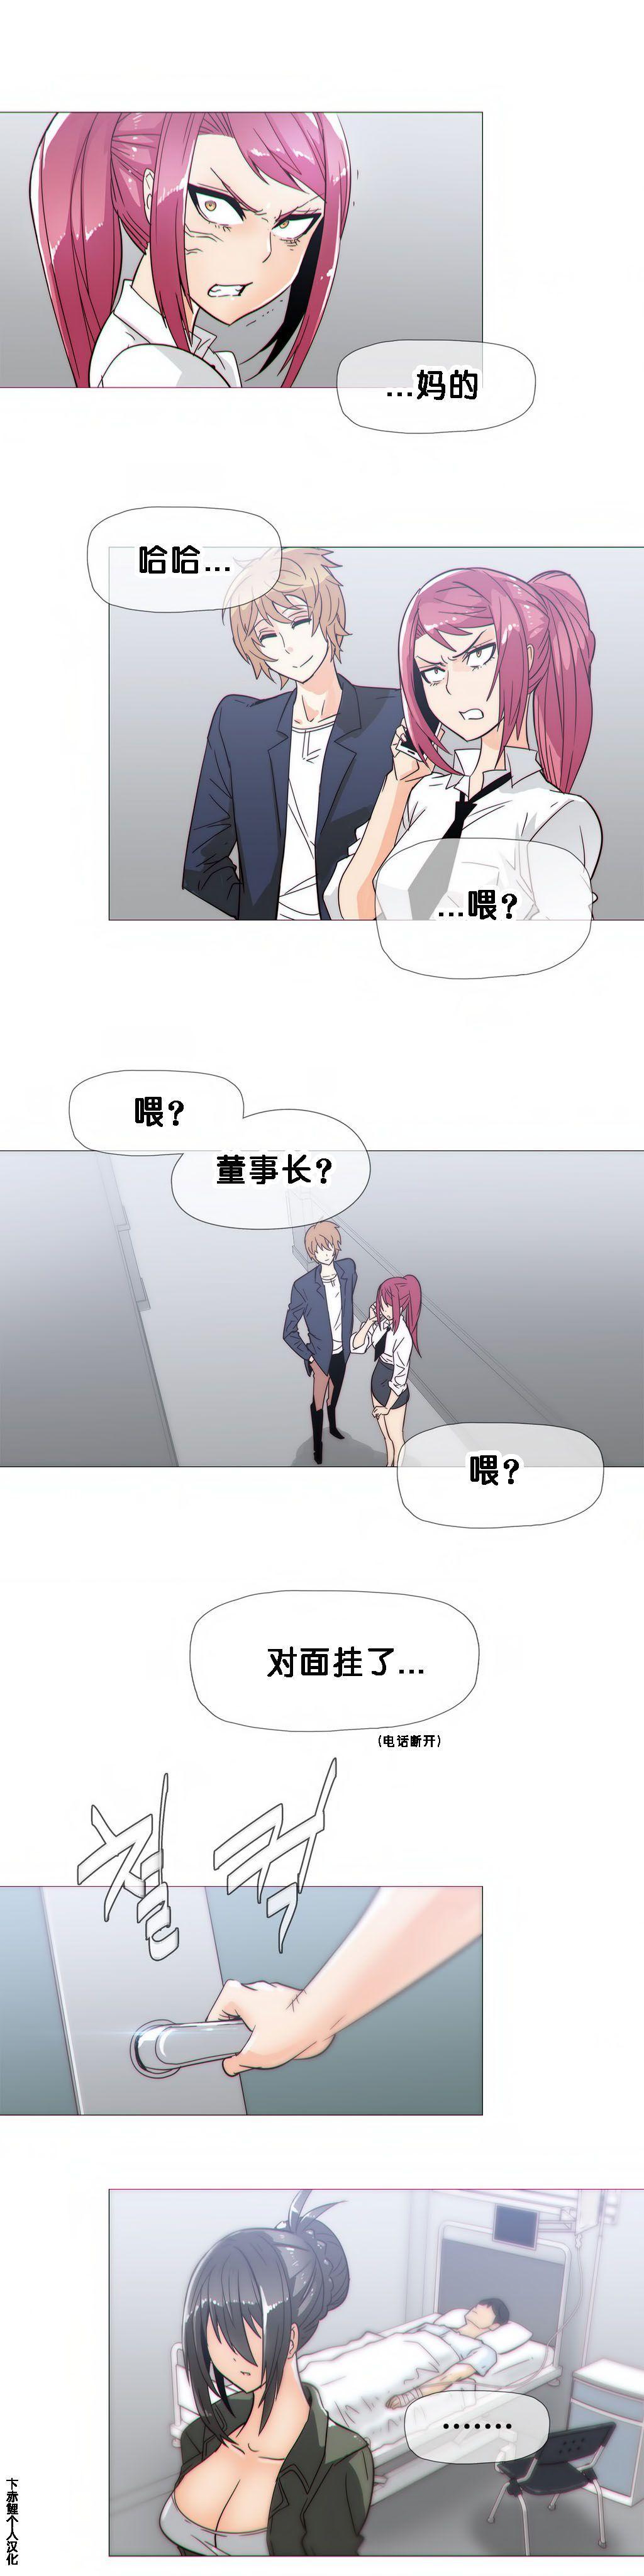 HouseHold Affairs 【卞赤鲤个人汉化】1~33话(持续更新中) 460